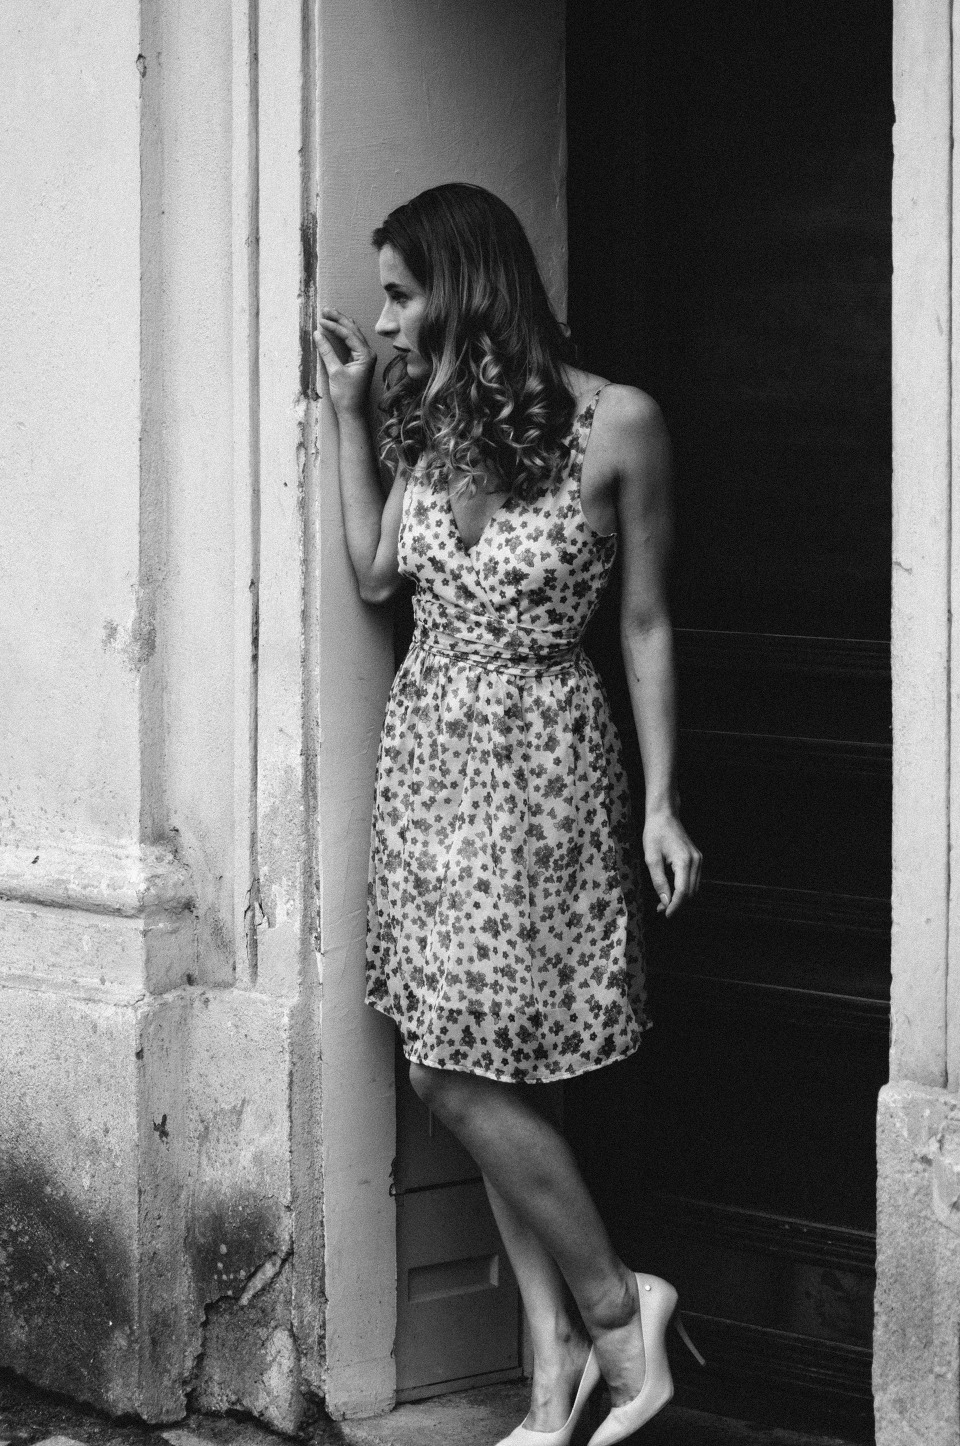 Pics Izabella Wasiniewska nudes (56 photos), Tits, Leaked, Instagram, bra 2006